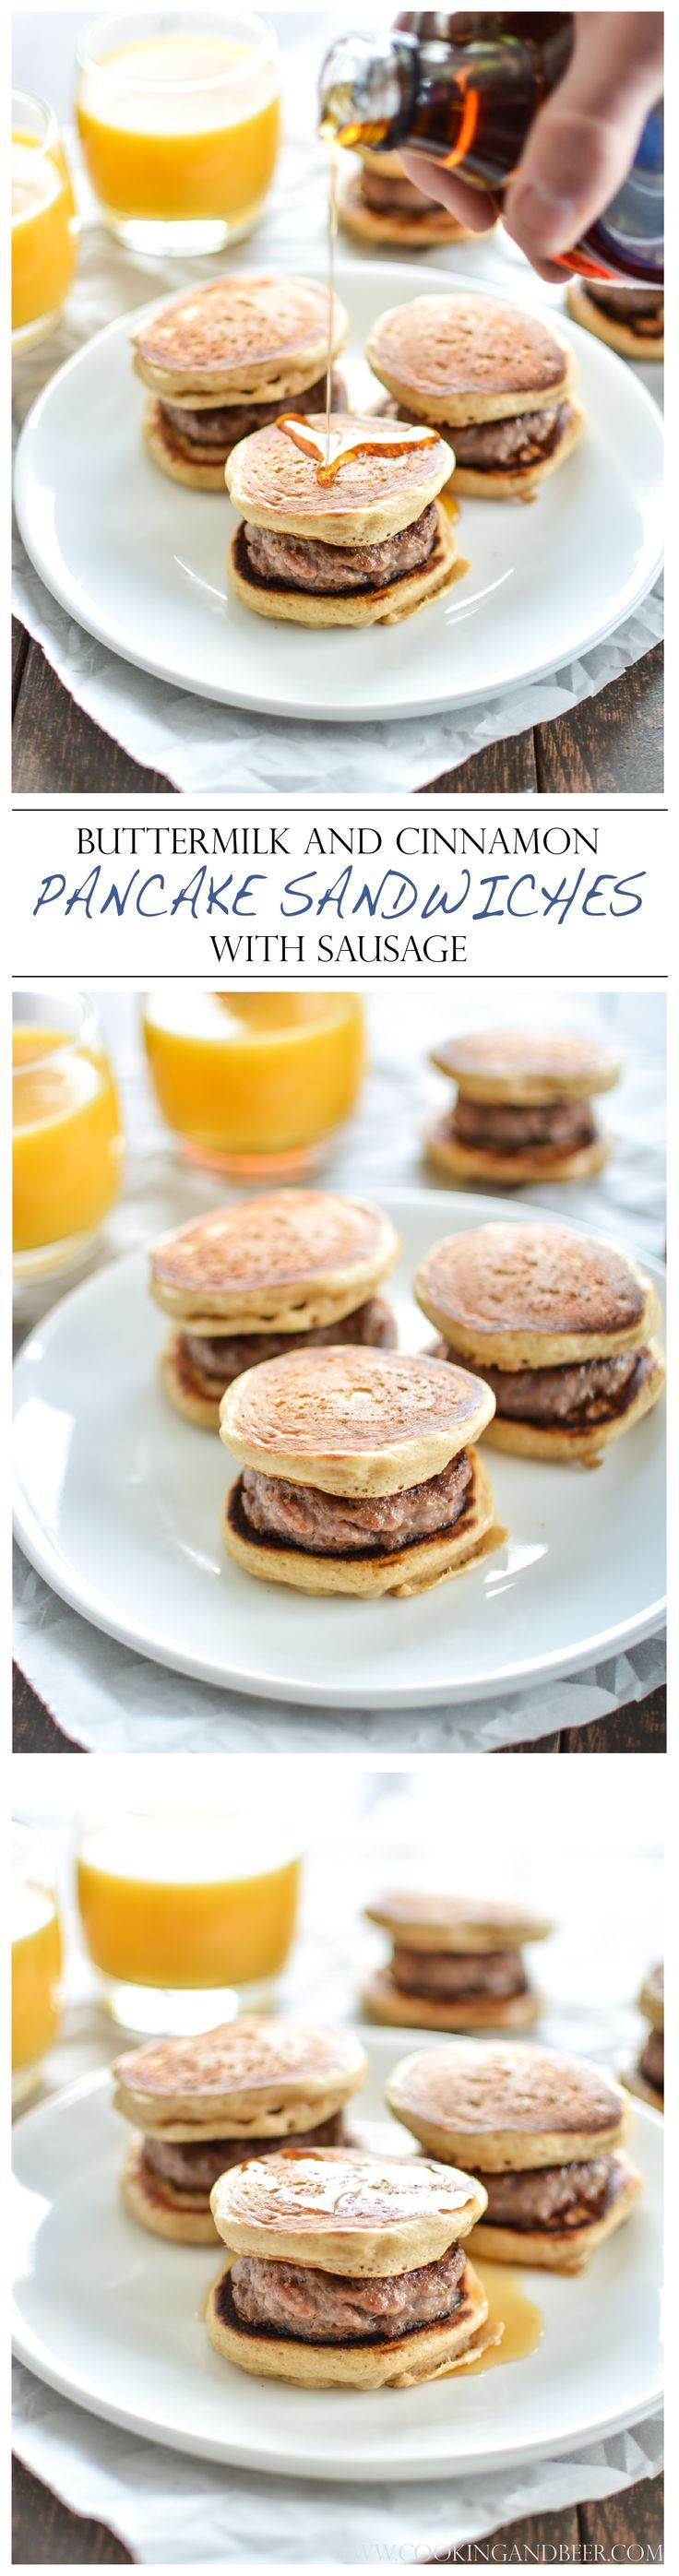 Buttermilk and Cinnamon Mini Pancake Sandwiches with Sausage   www.cookingandbeer.com   @jalanesulia